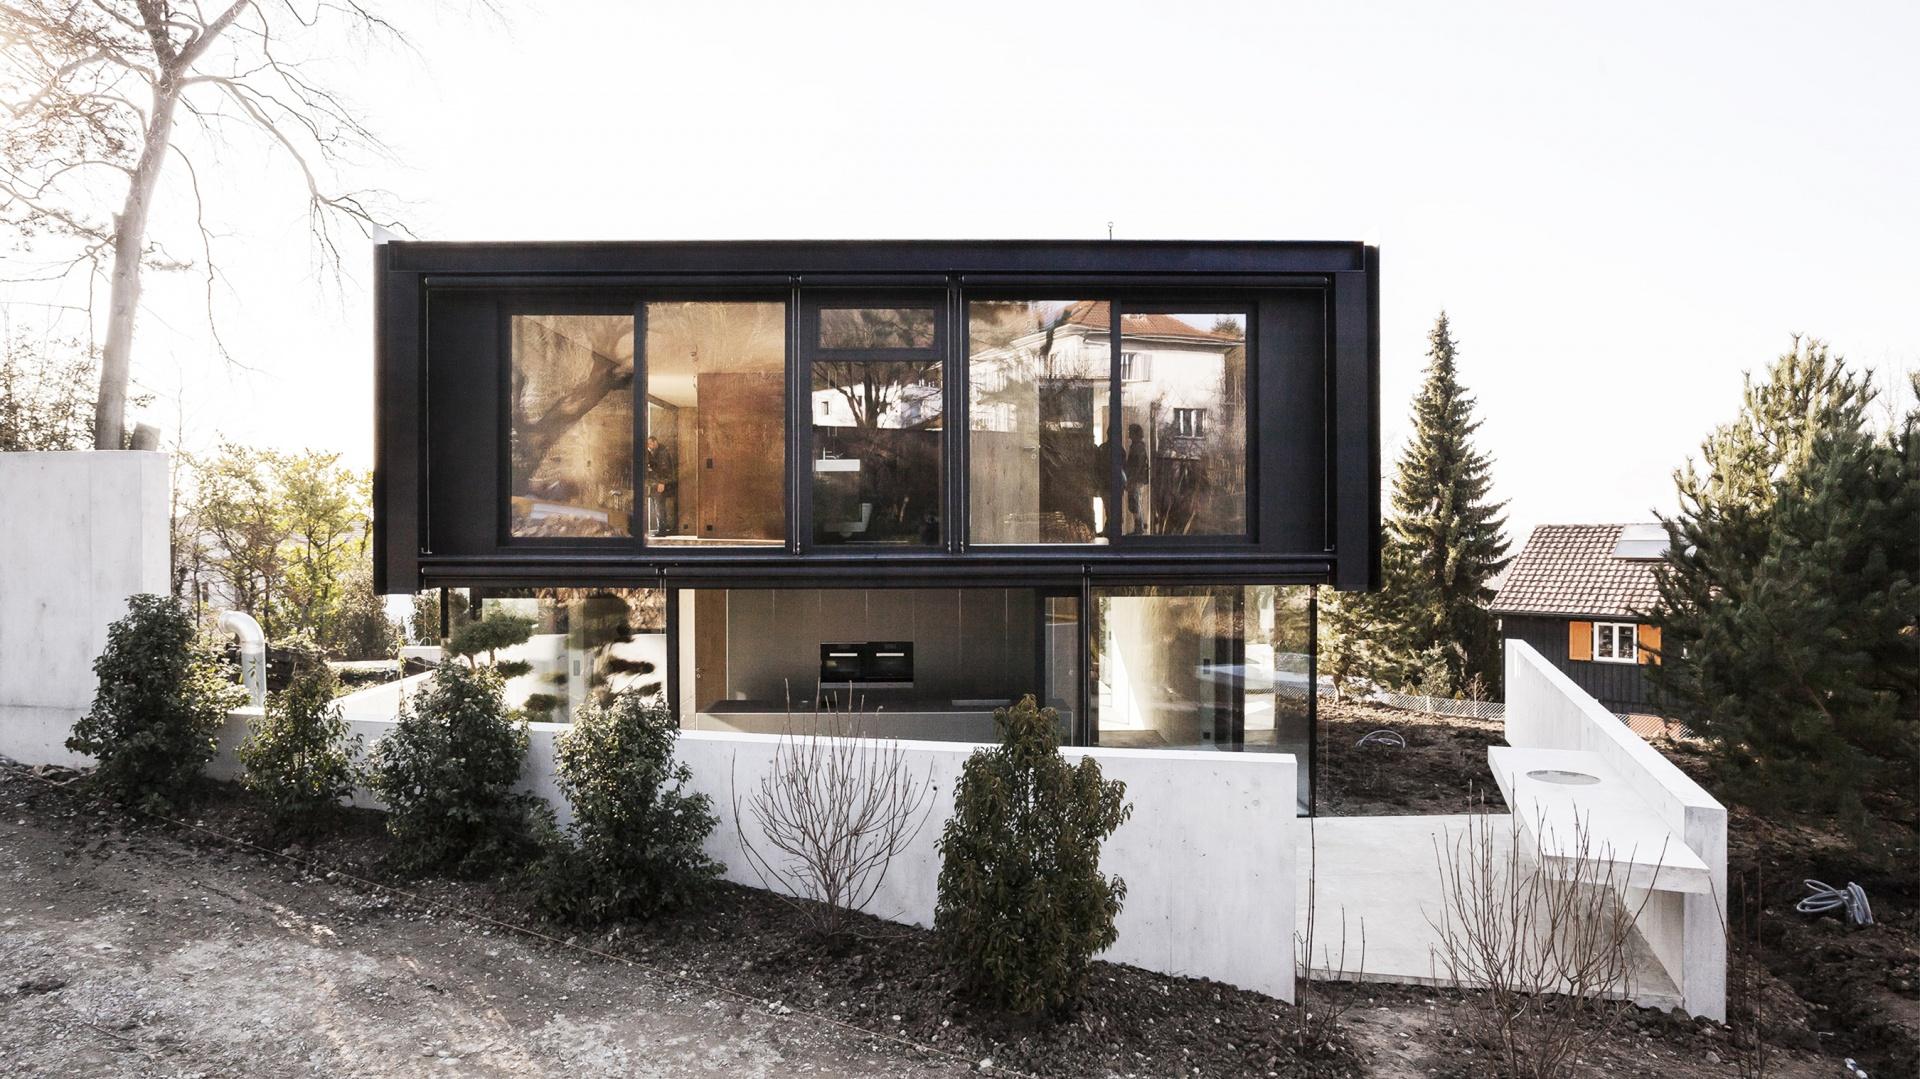 Holzvolumen auf dem Betonkörper  © Eik Frenzel